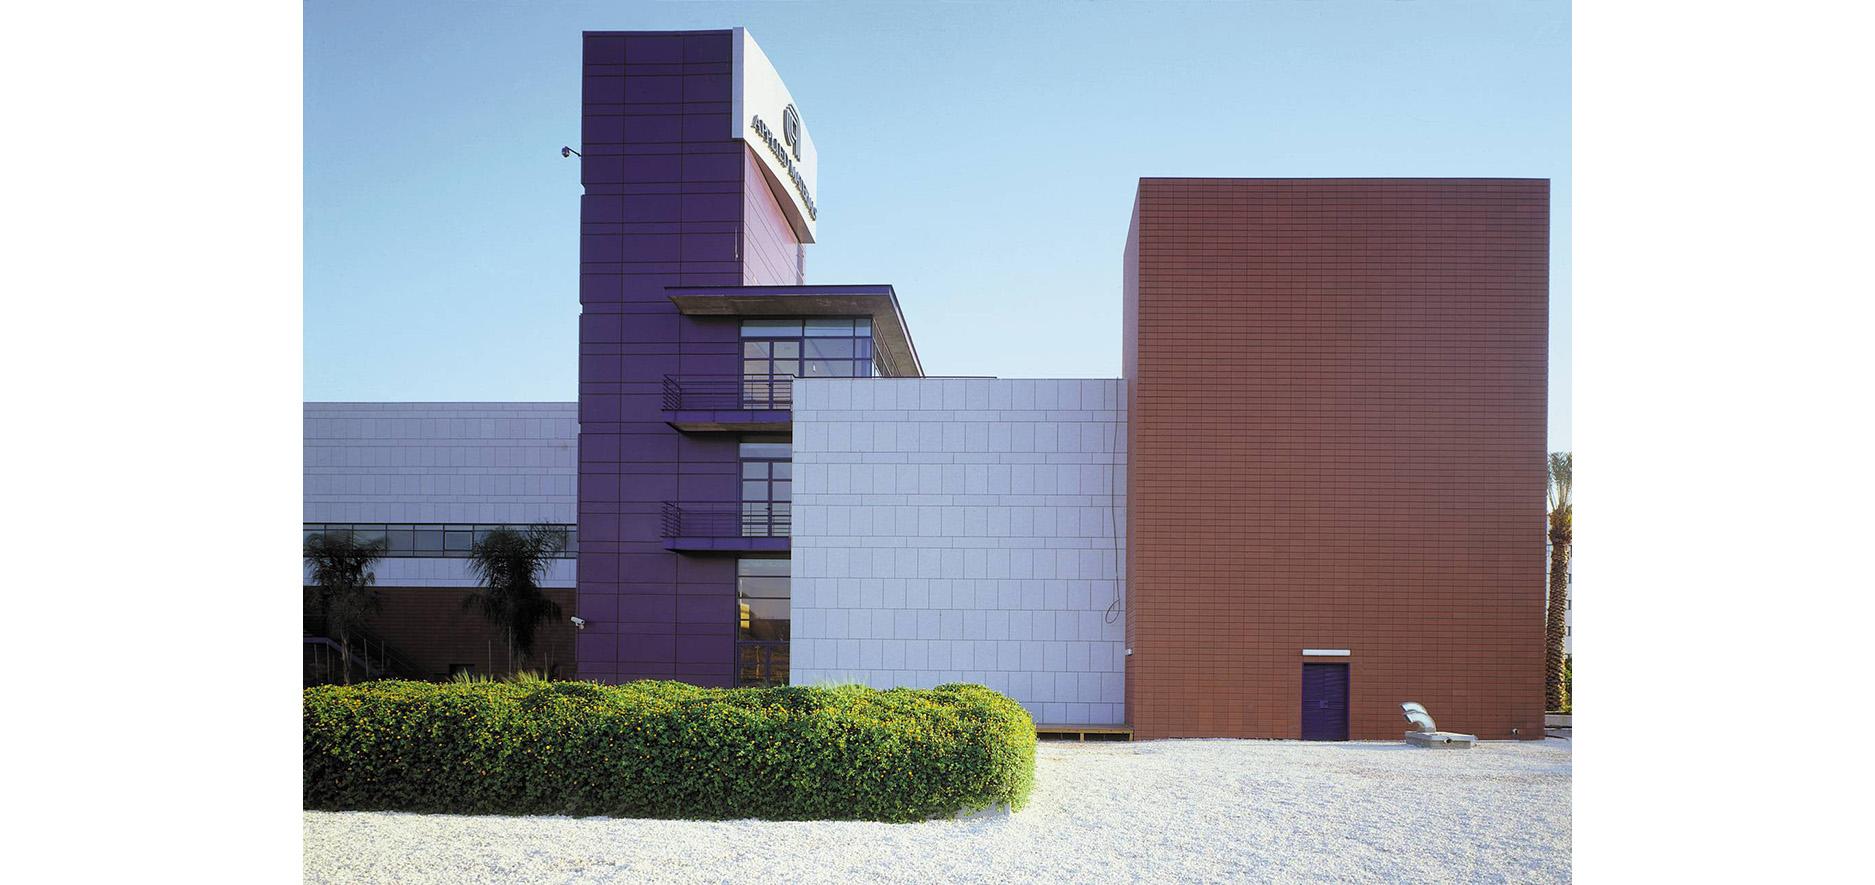 Binyan_Applied_materials_by_KolkerEpstein_Architects002